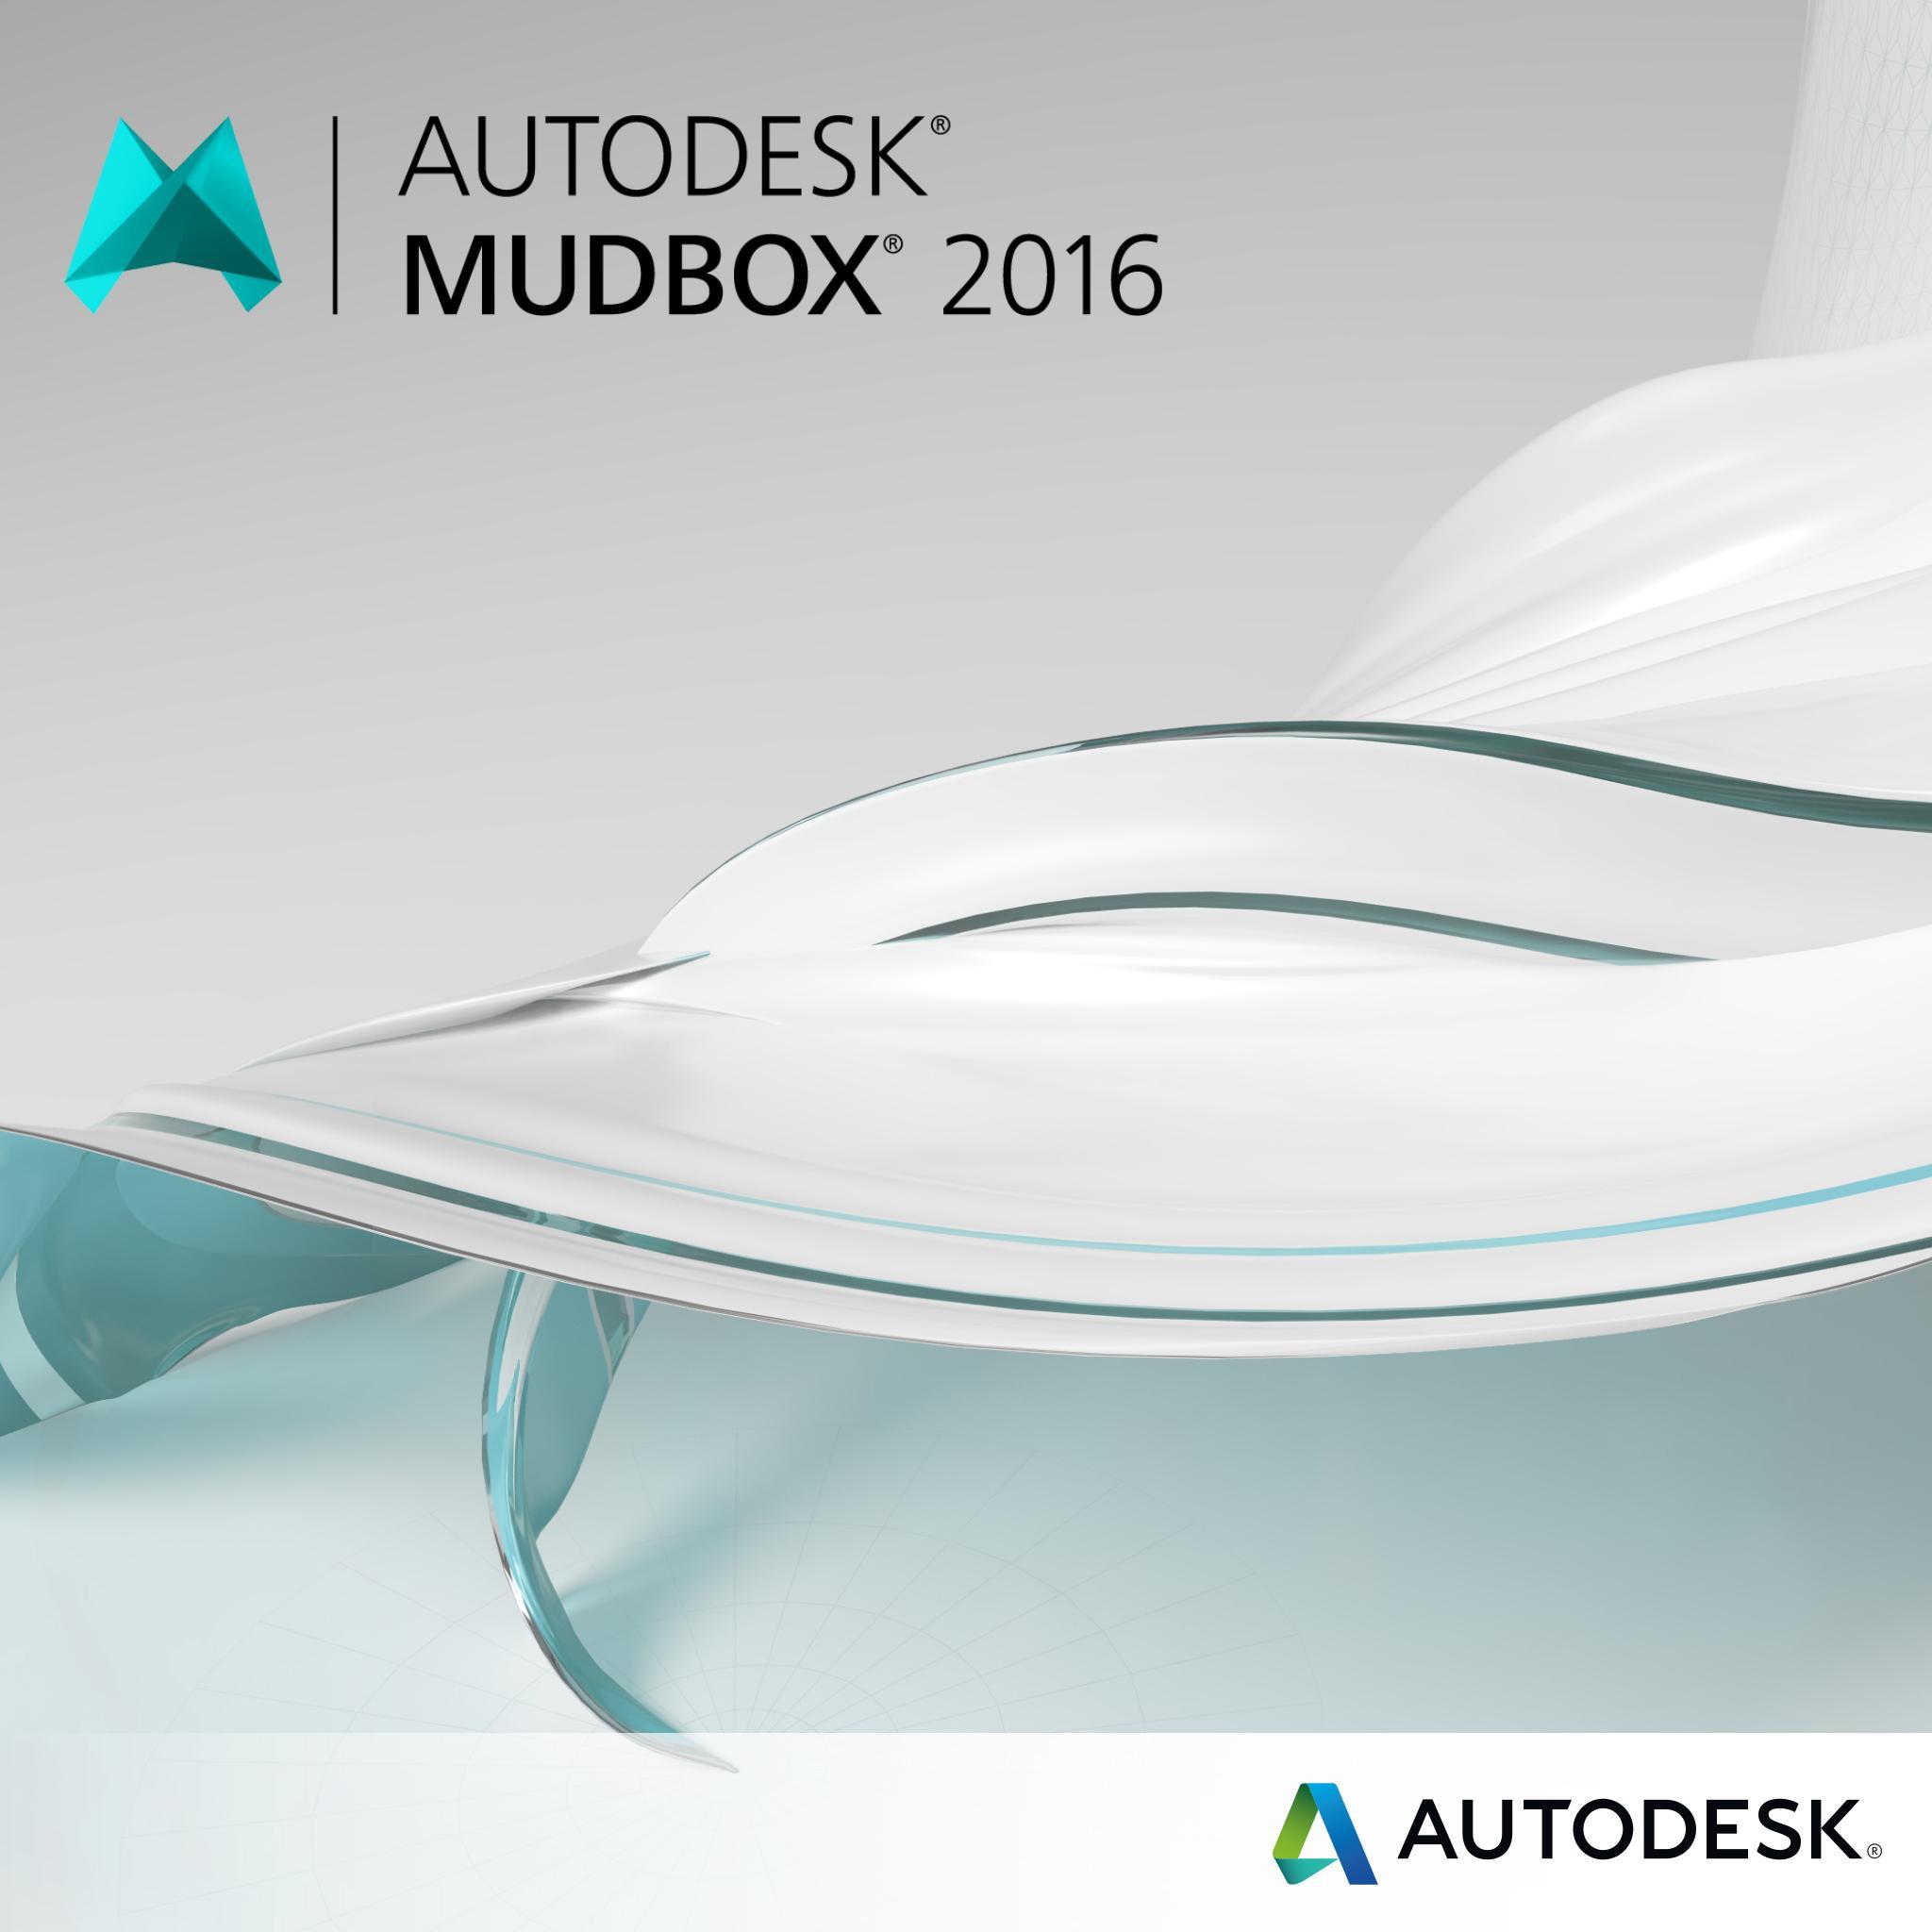 Mudbox 2017 price